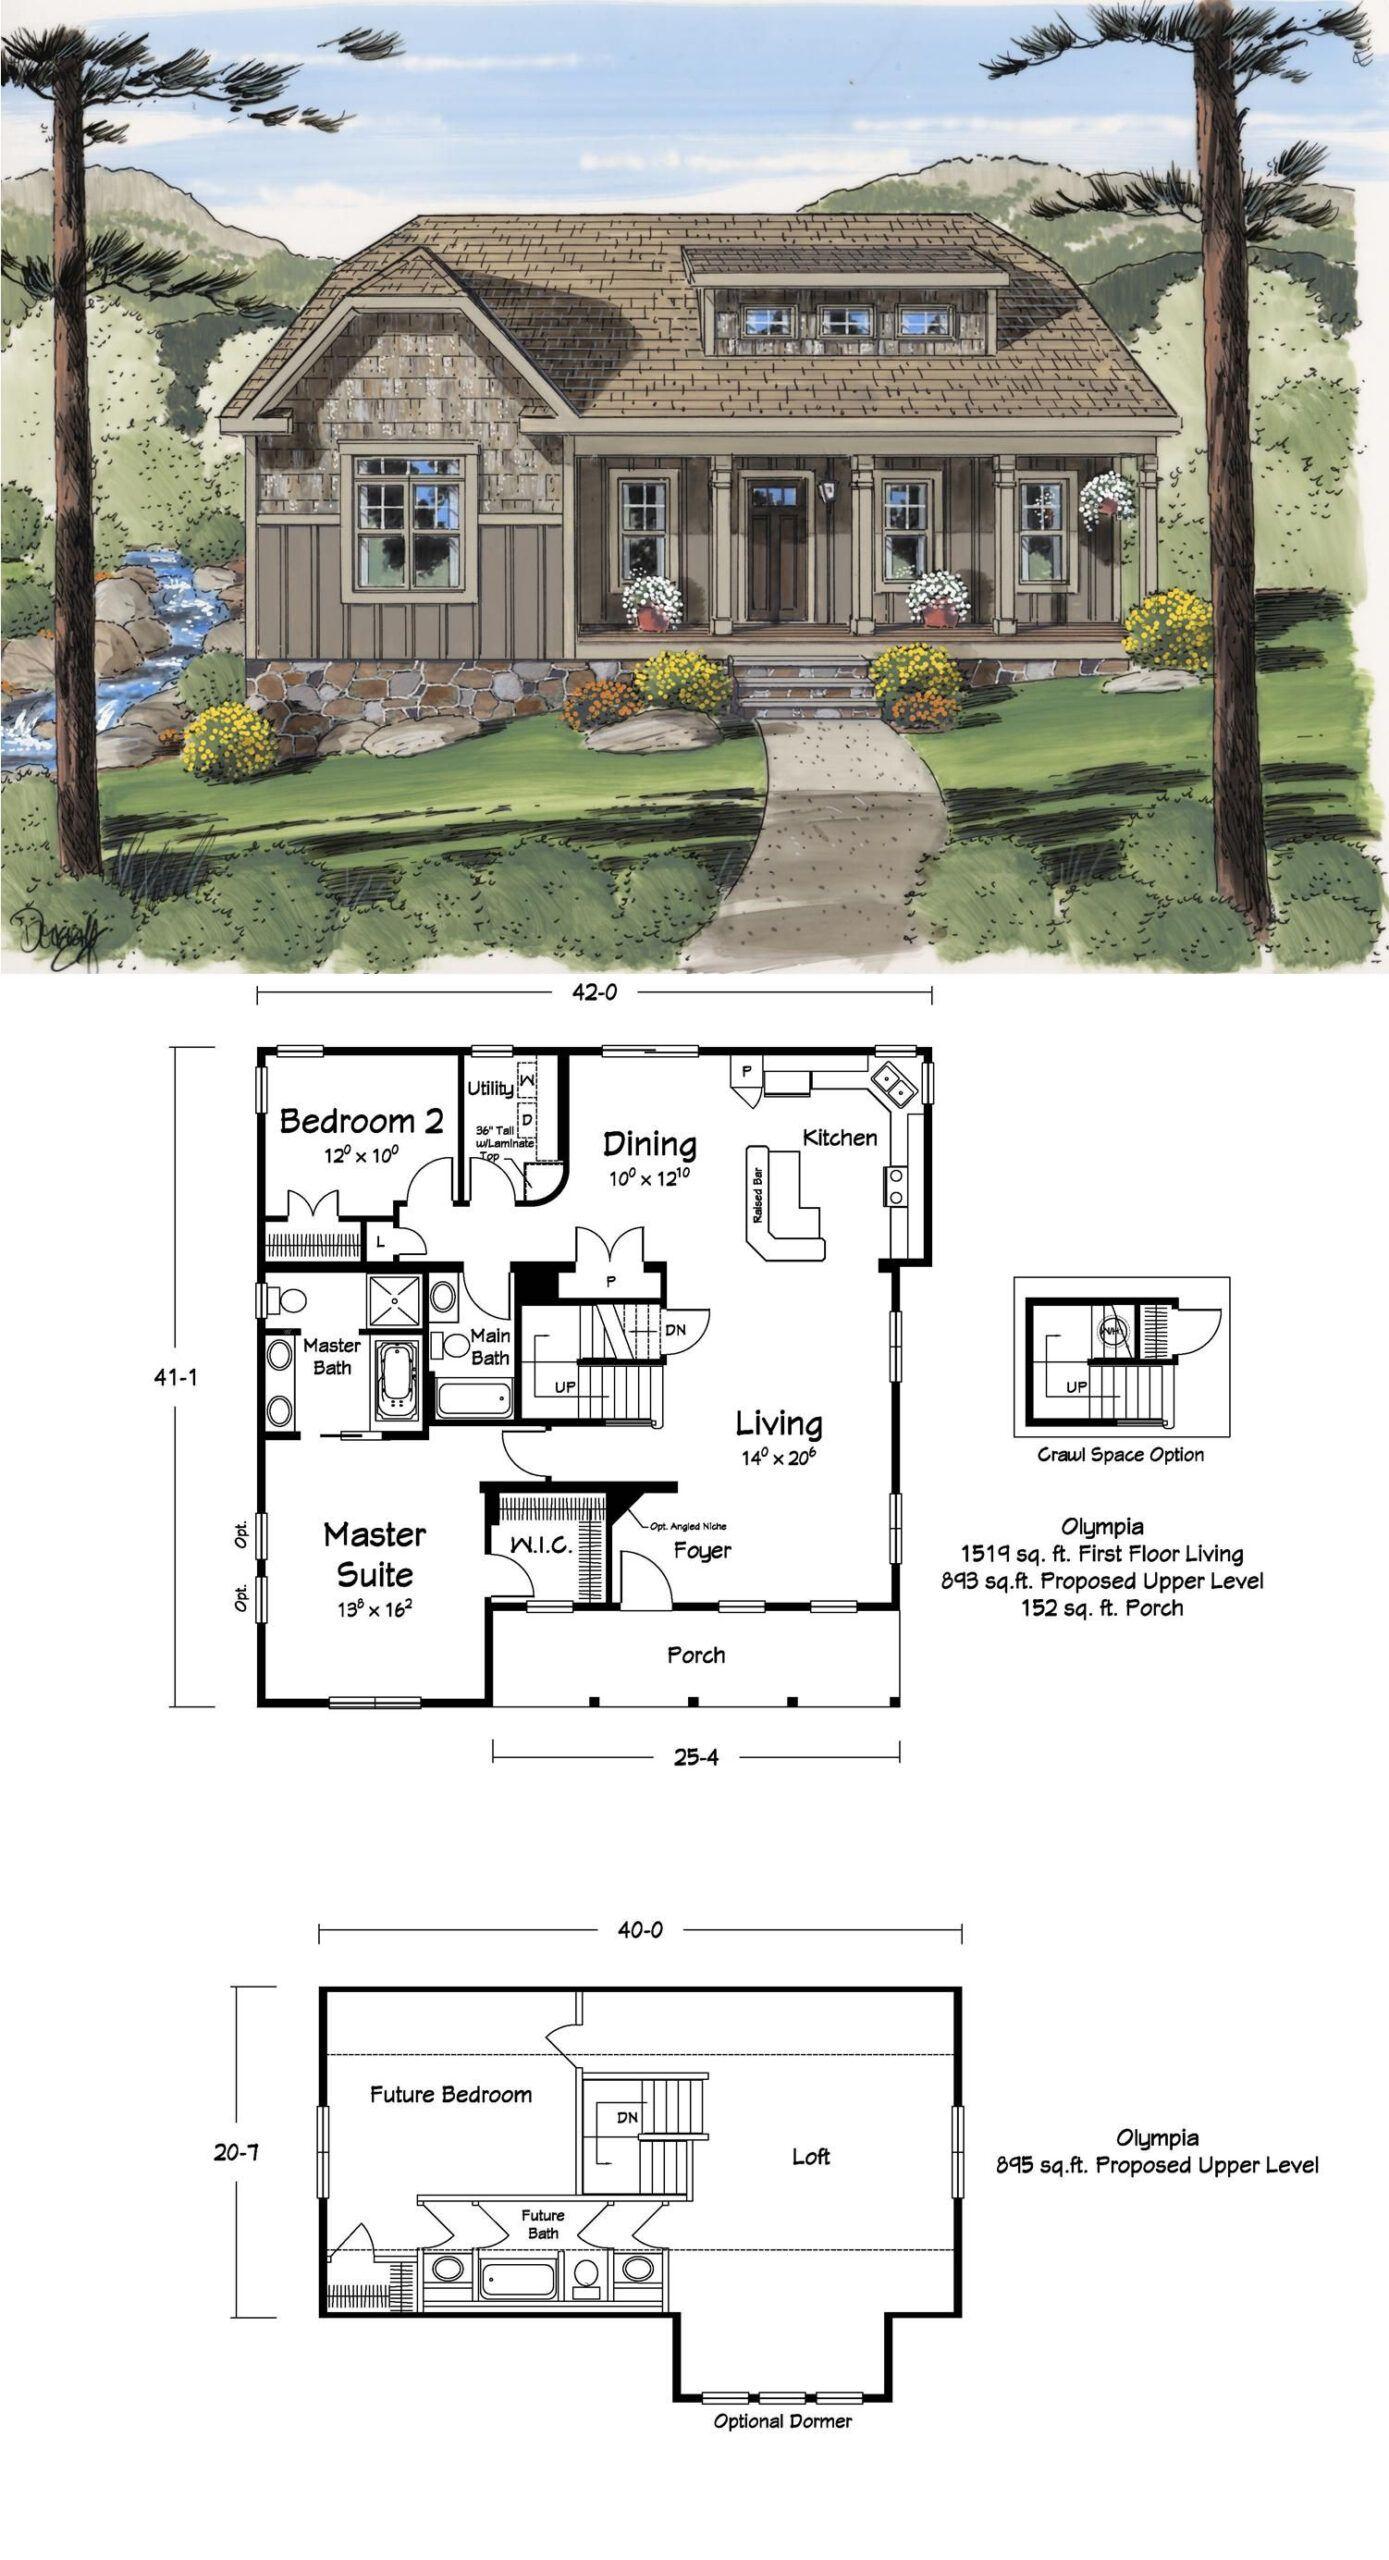 House Plans With Loft In 2020 Mountain House Plans Loft Floor Plans Cabin Floor Plans